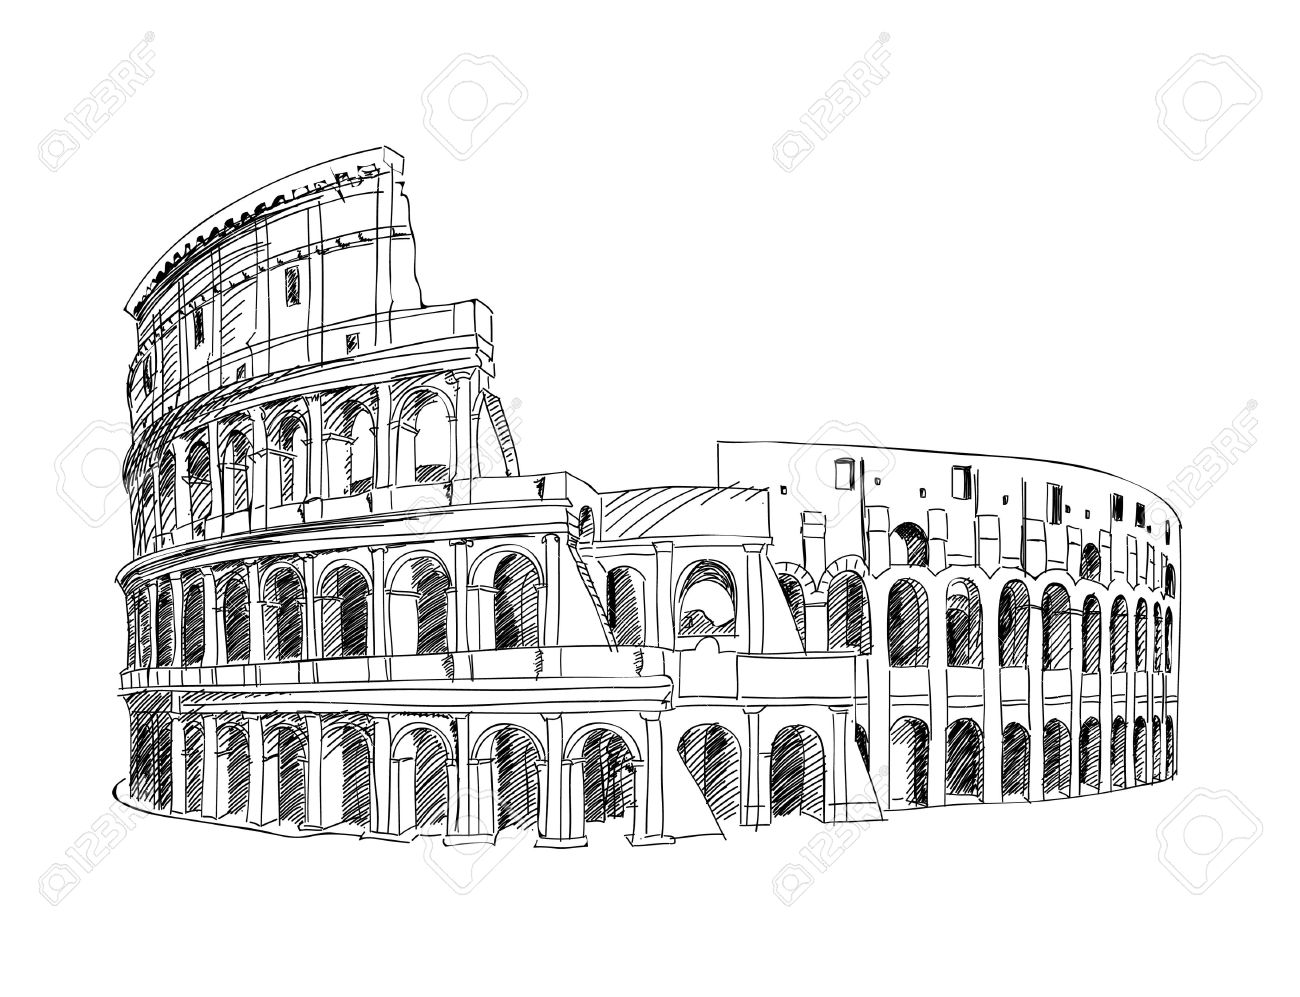 Colosseum in Rome, Italy  Landmark of Coliseum, hand drawn illustration  Rome city landscape Stock Vector - 20980842